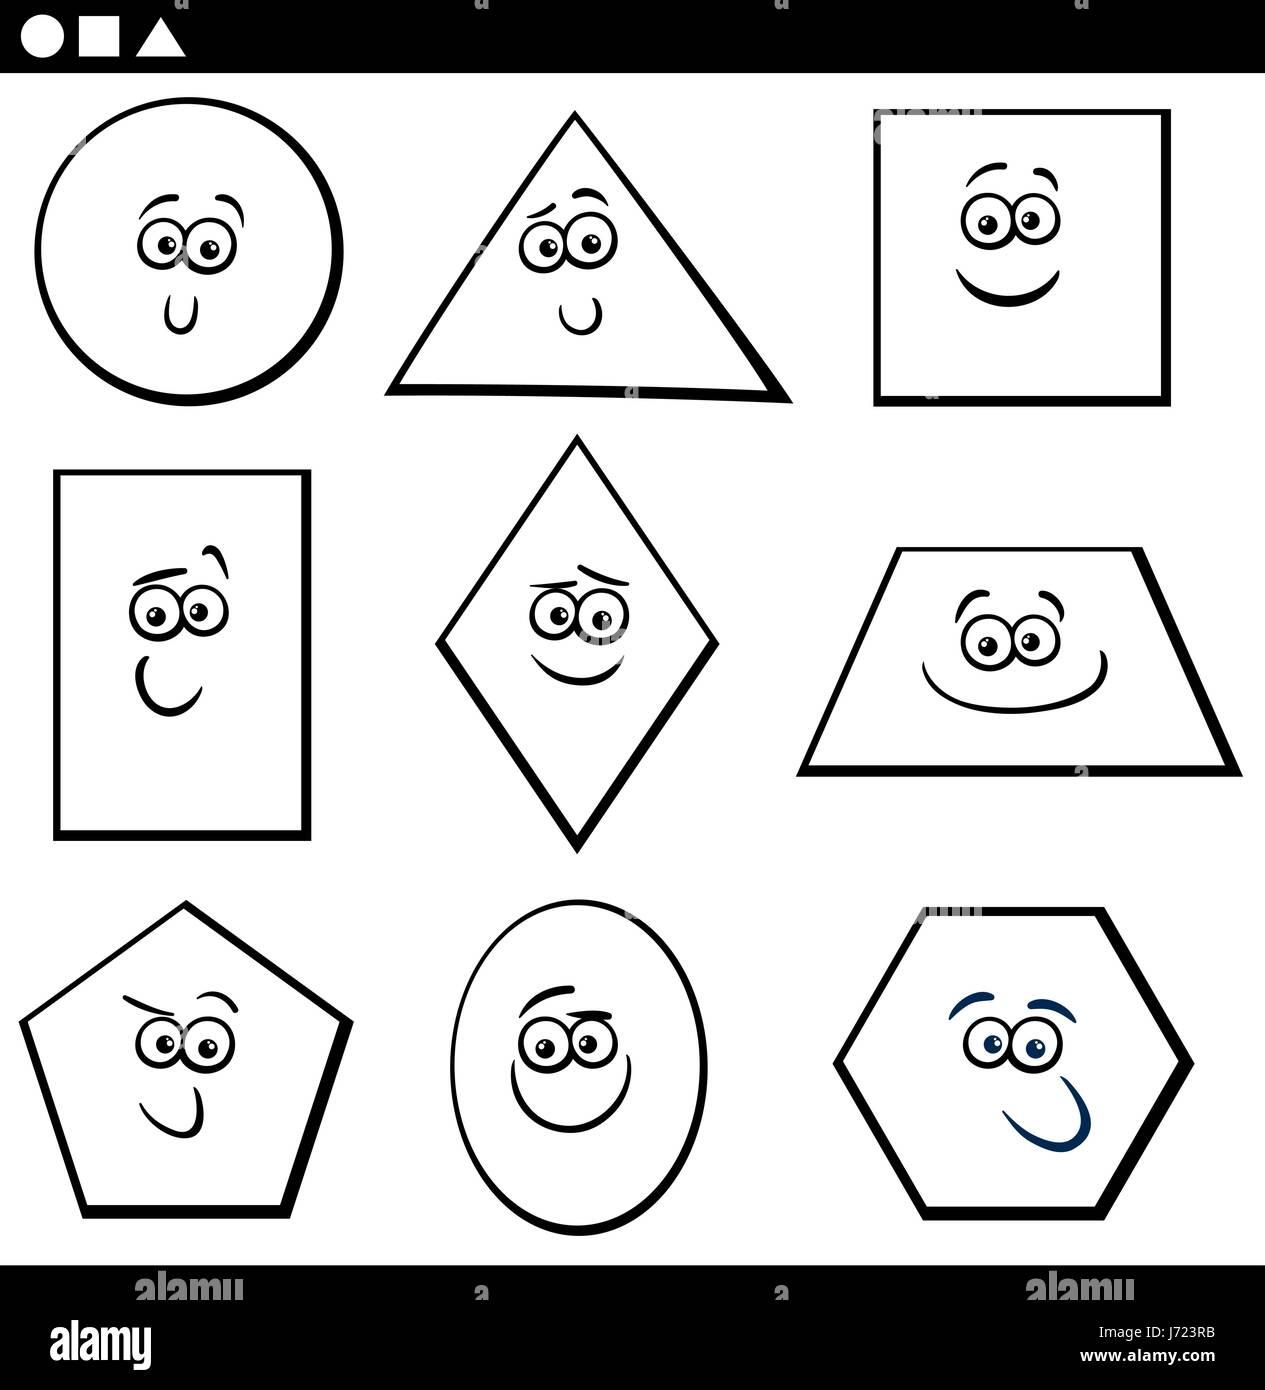 basic shapes stock photos   basic shapes stock images alamy Owl Drawings Owl Psychedelic Art